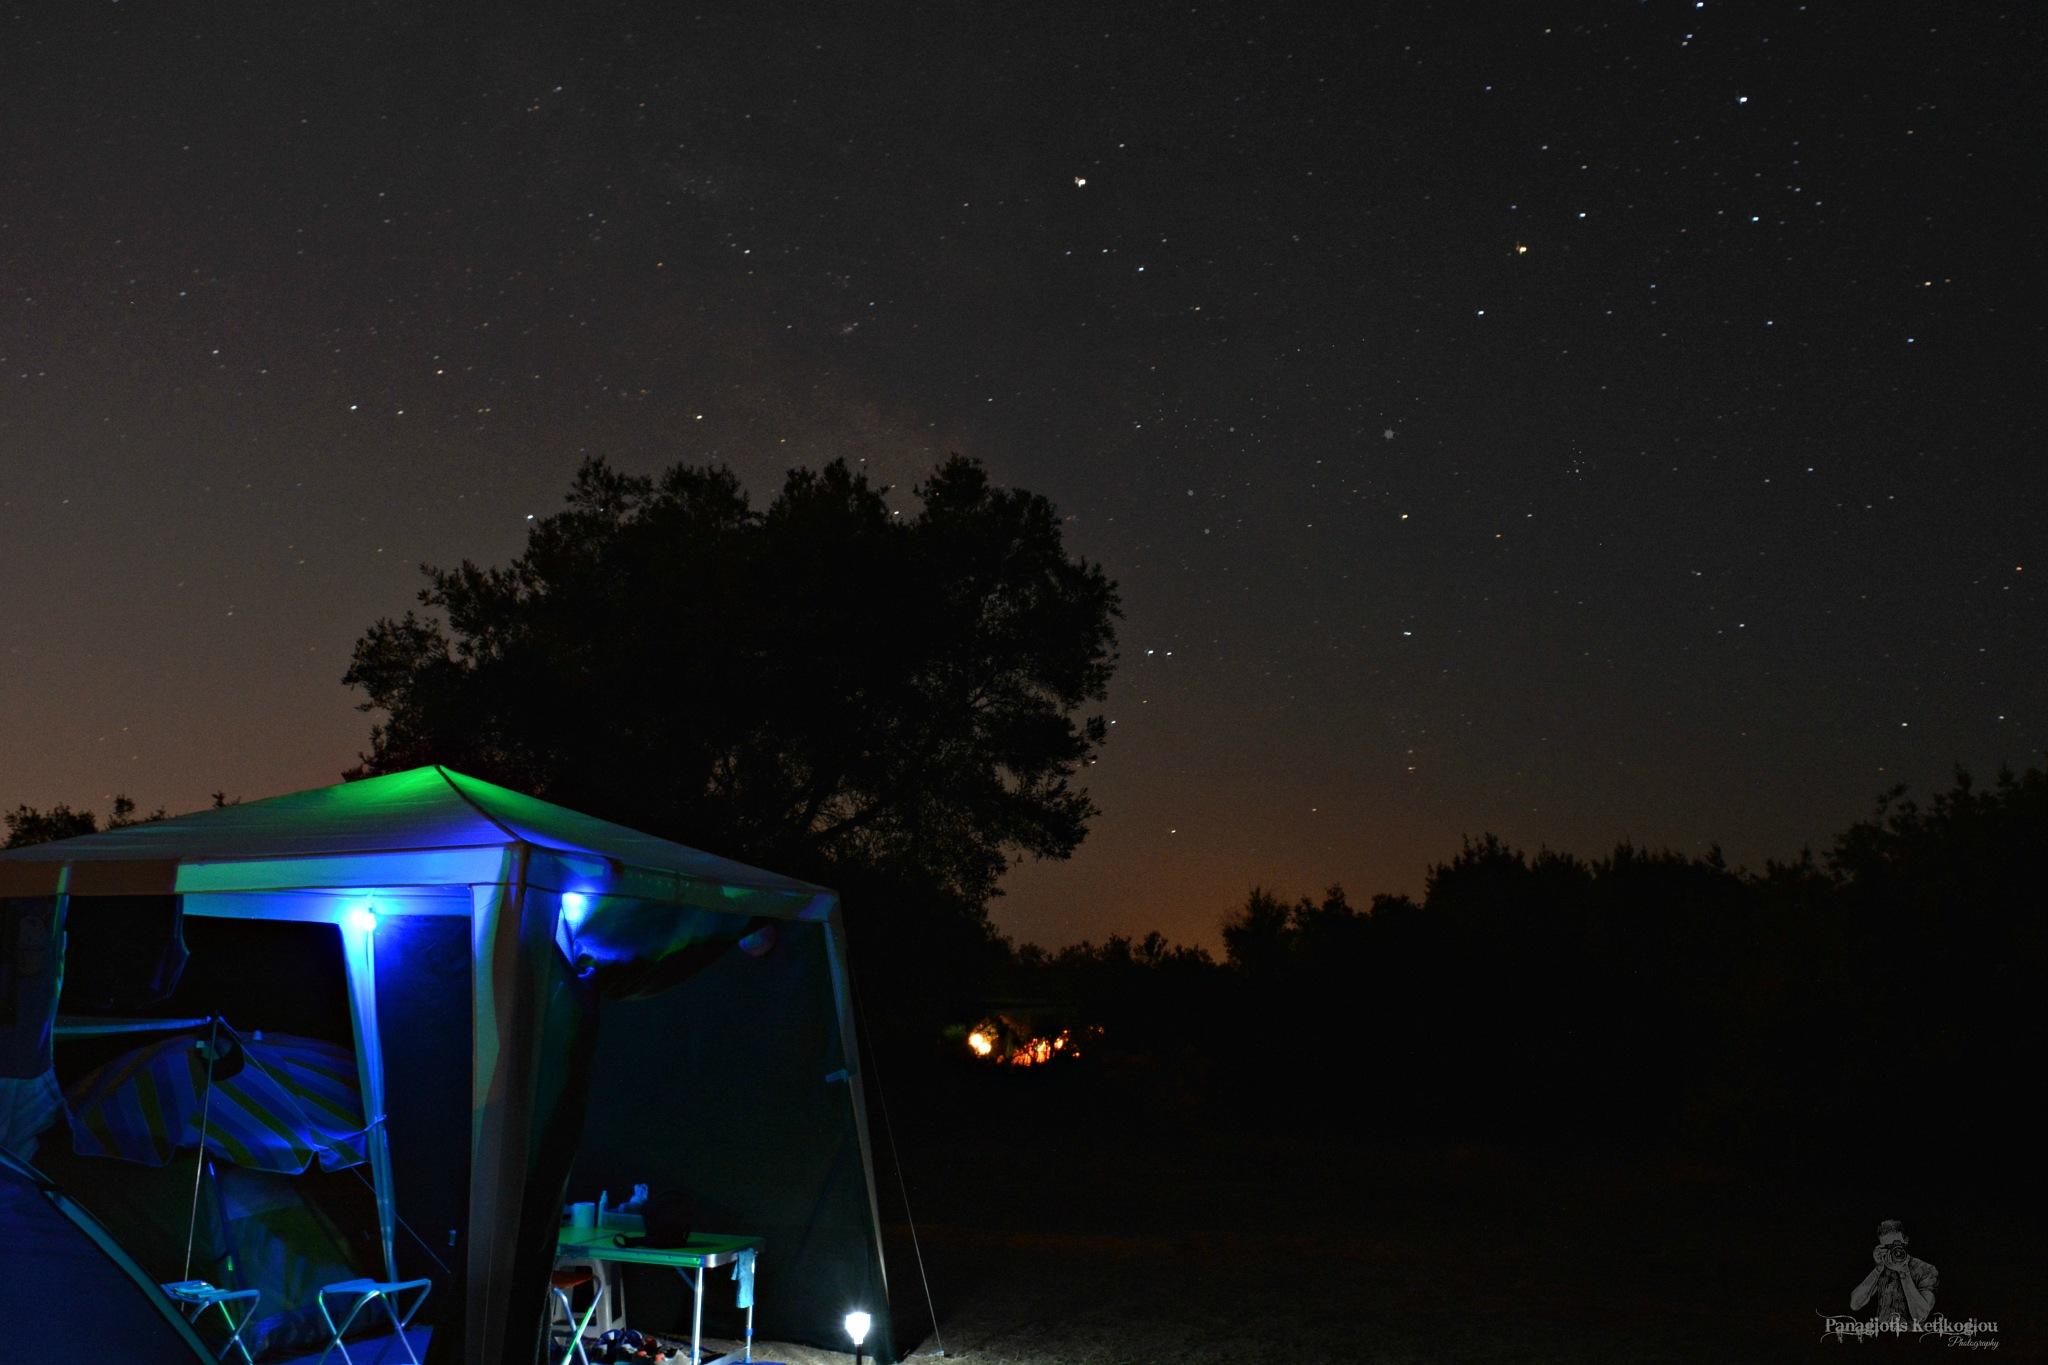 Under the stars by Panagiotis Ketikoglou